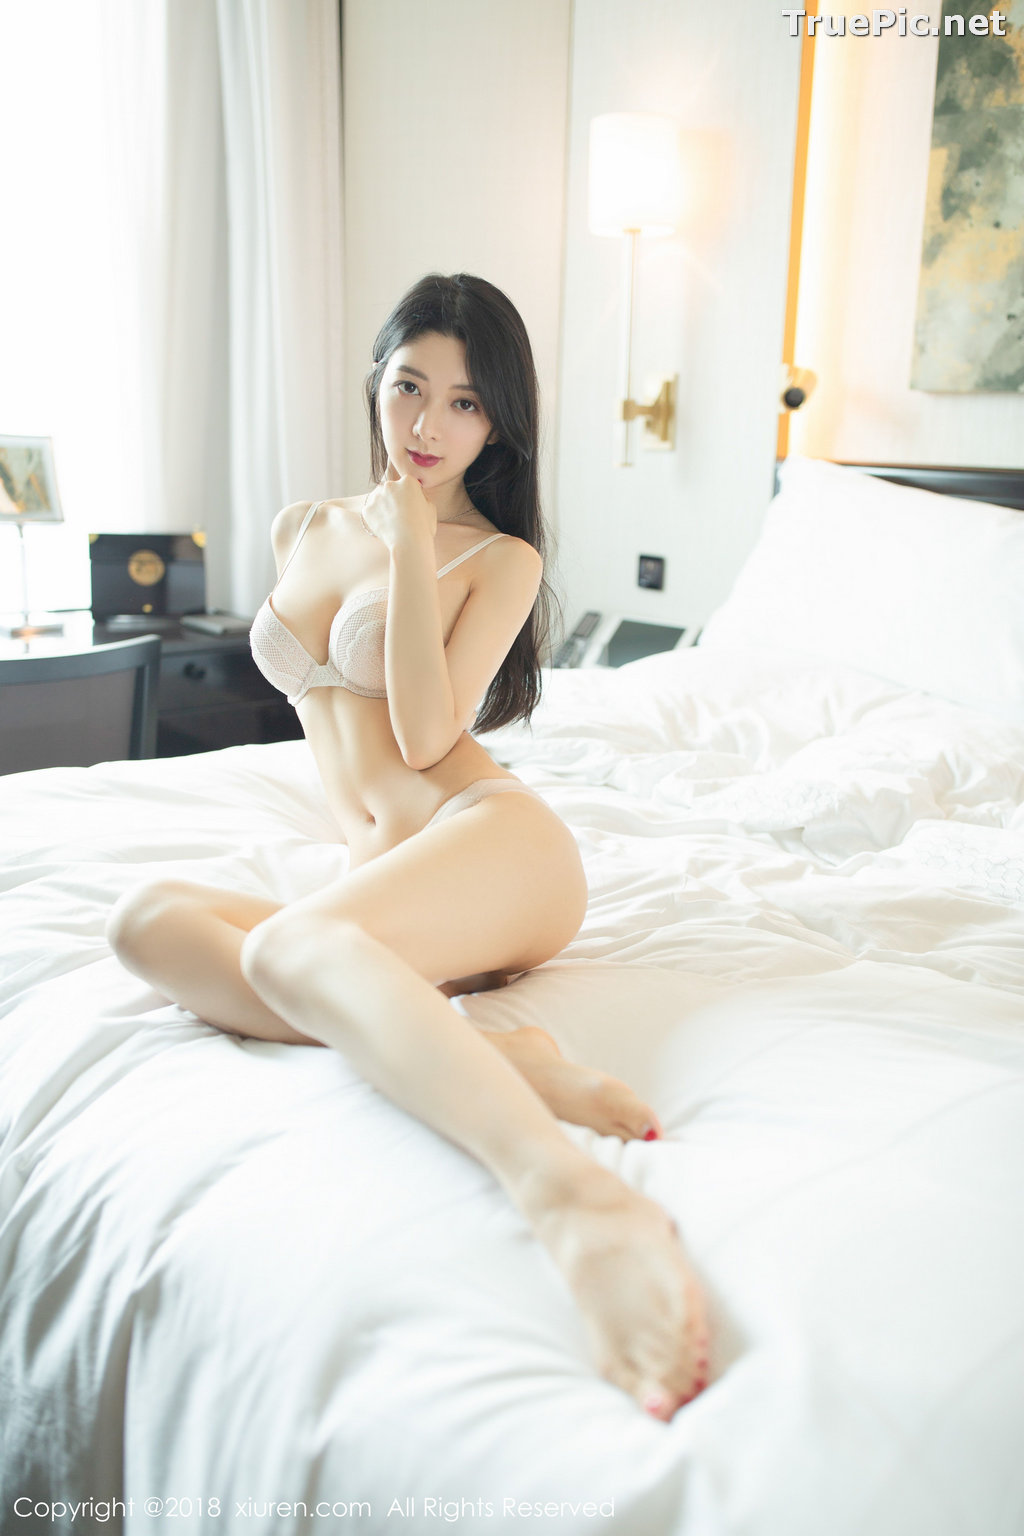 Image XIUREN No.1141 - Chinese Model - Xiao Reba (Angela小热巴) - Sexy Dress Tonight - TruePic.net - Picture-43